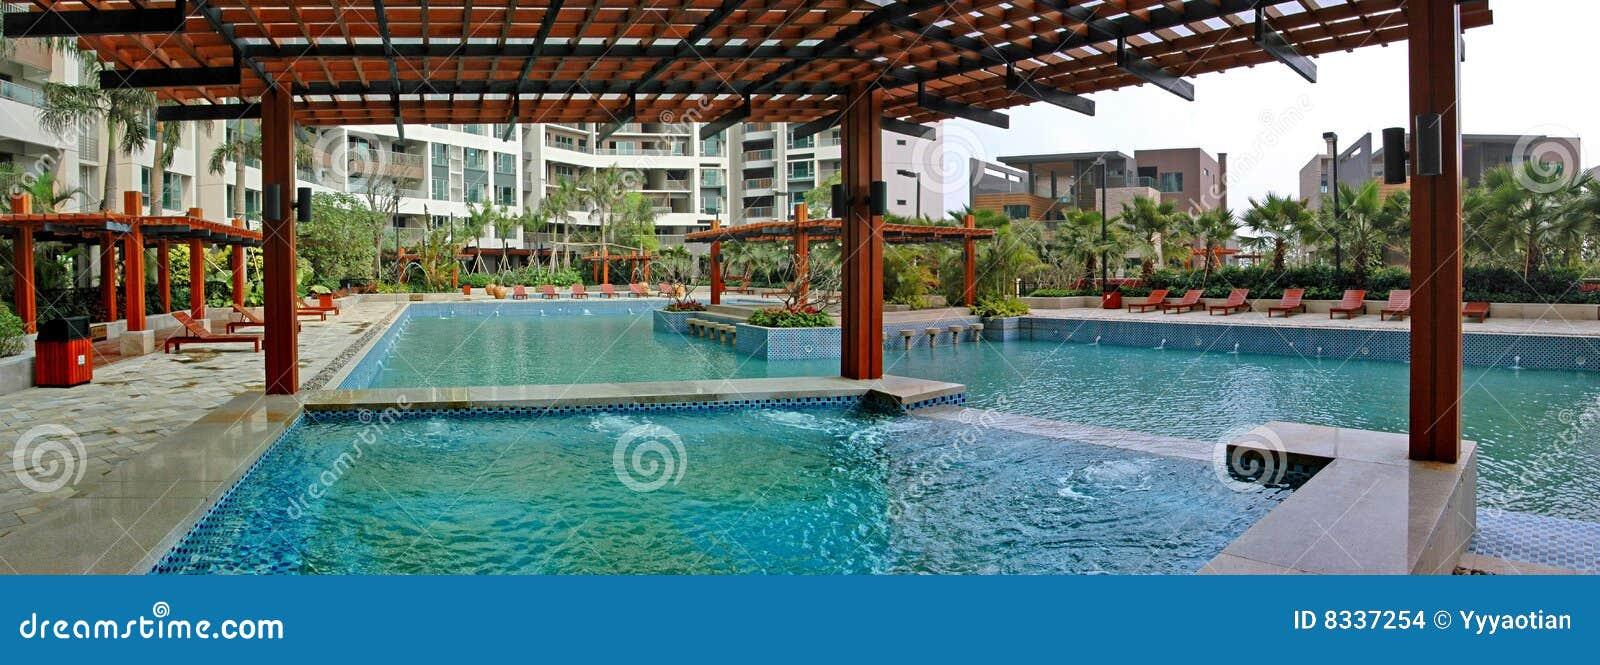 Pergola And Swimming Pool Stock Images Image 8337254